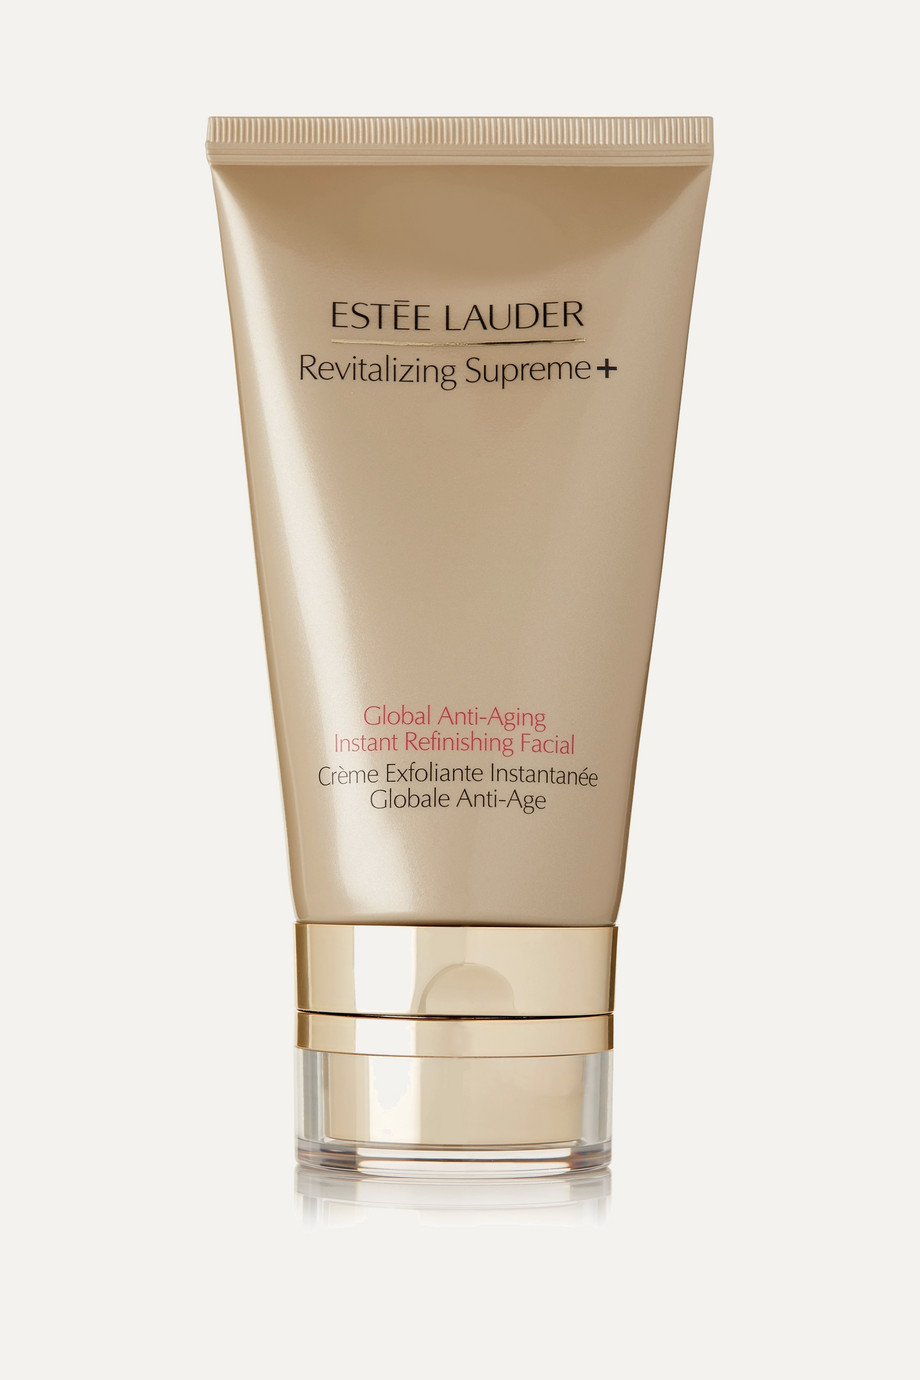 Estée Lauder Revitalizing Supreme + Global Anti-Aging Instant Refinishing Facial, 75ml